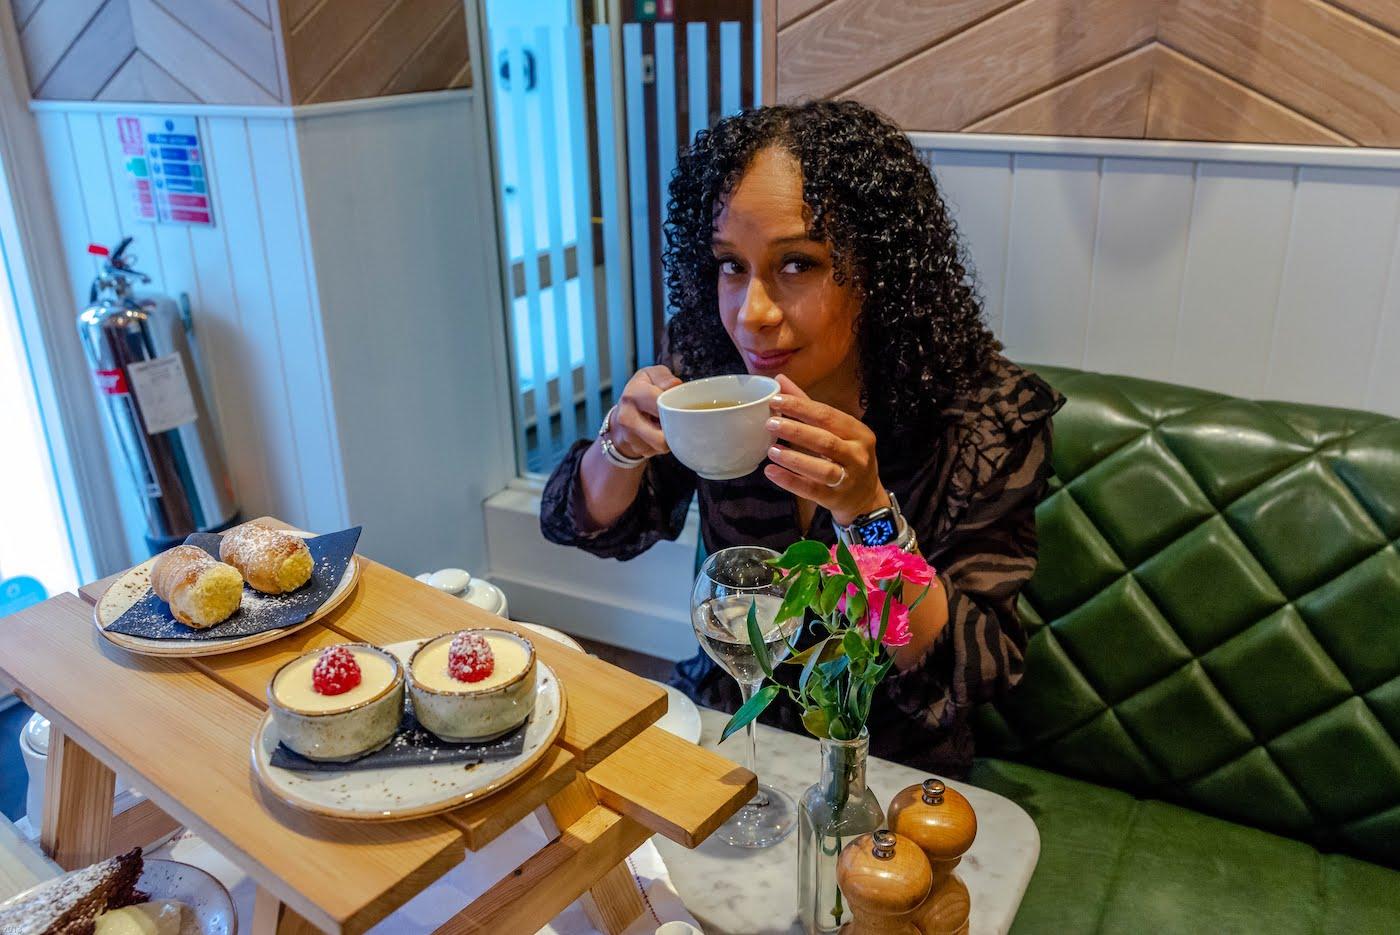 Two days in London. Having High Tea in London.